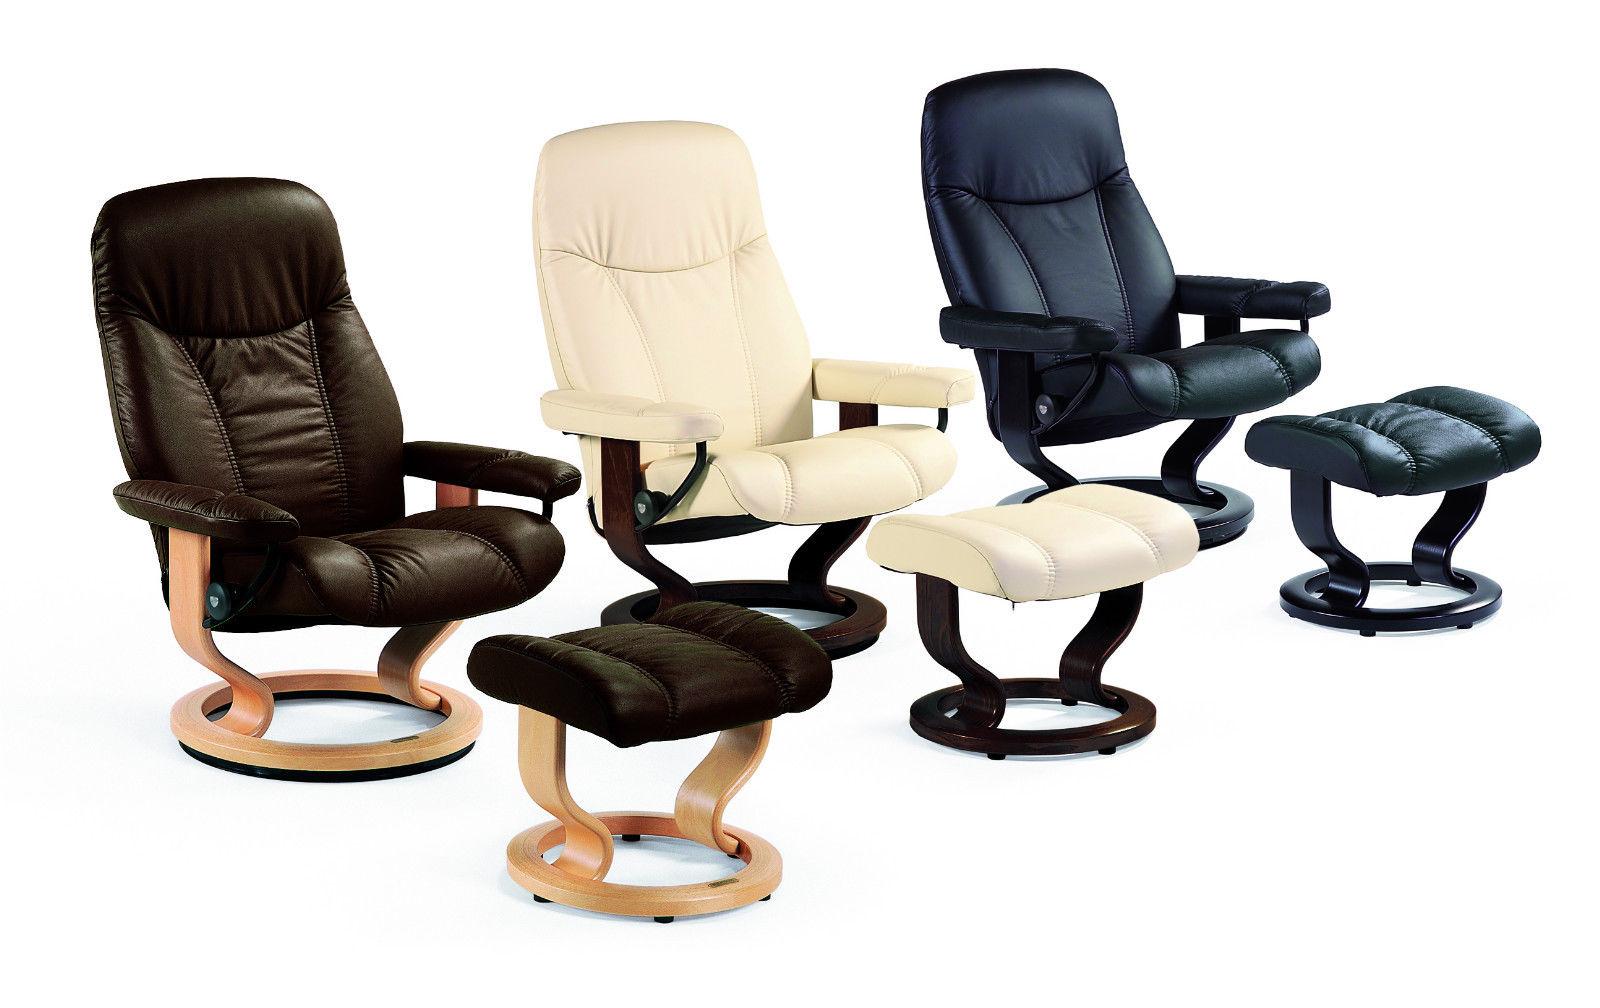 stressless consul relaxsessel mit hocker in leder. Black Bedroom Furniture Sets. Home Design Ideas